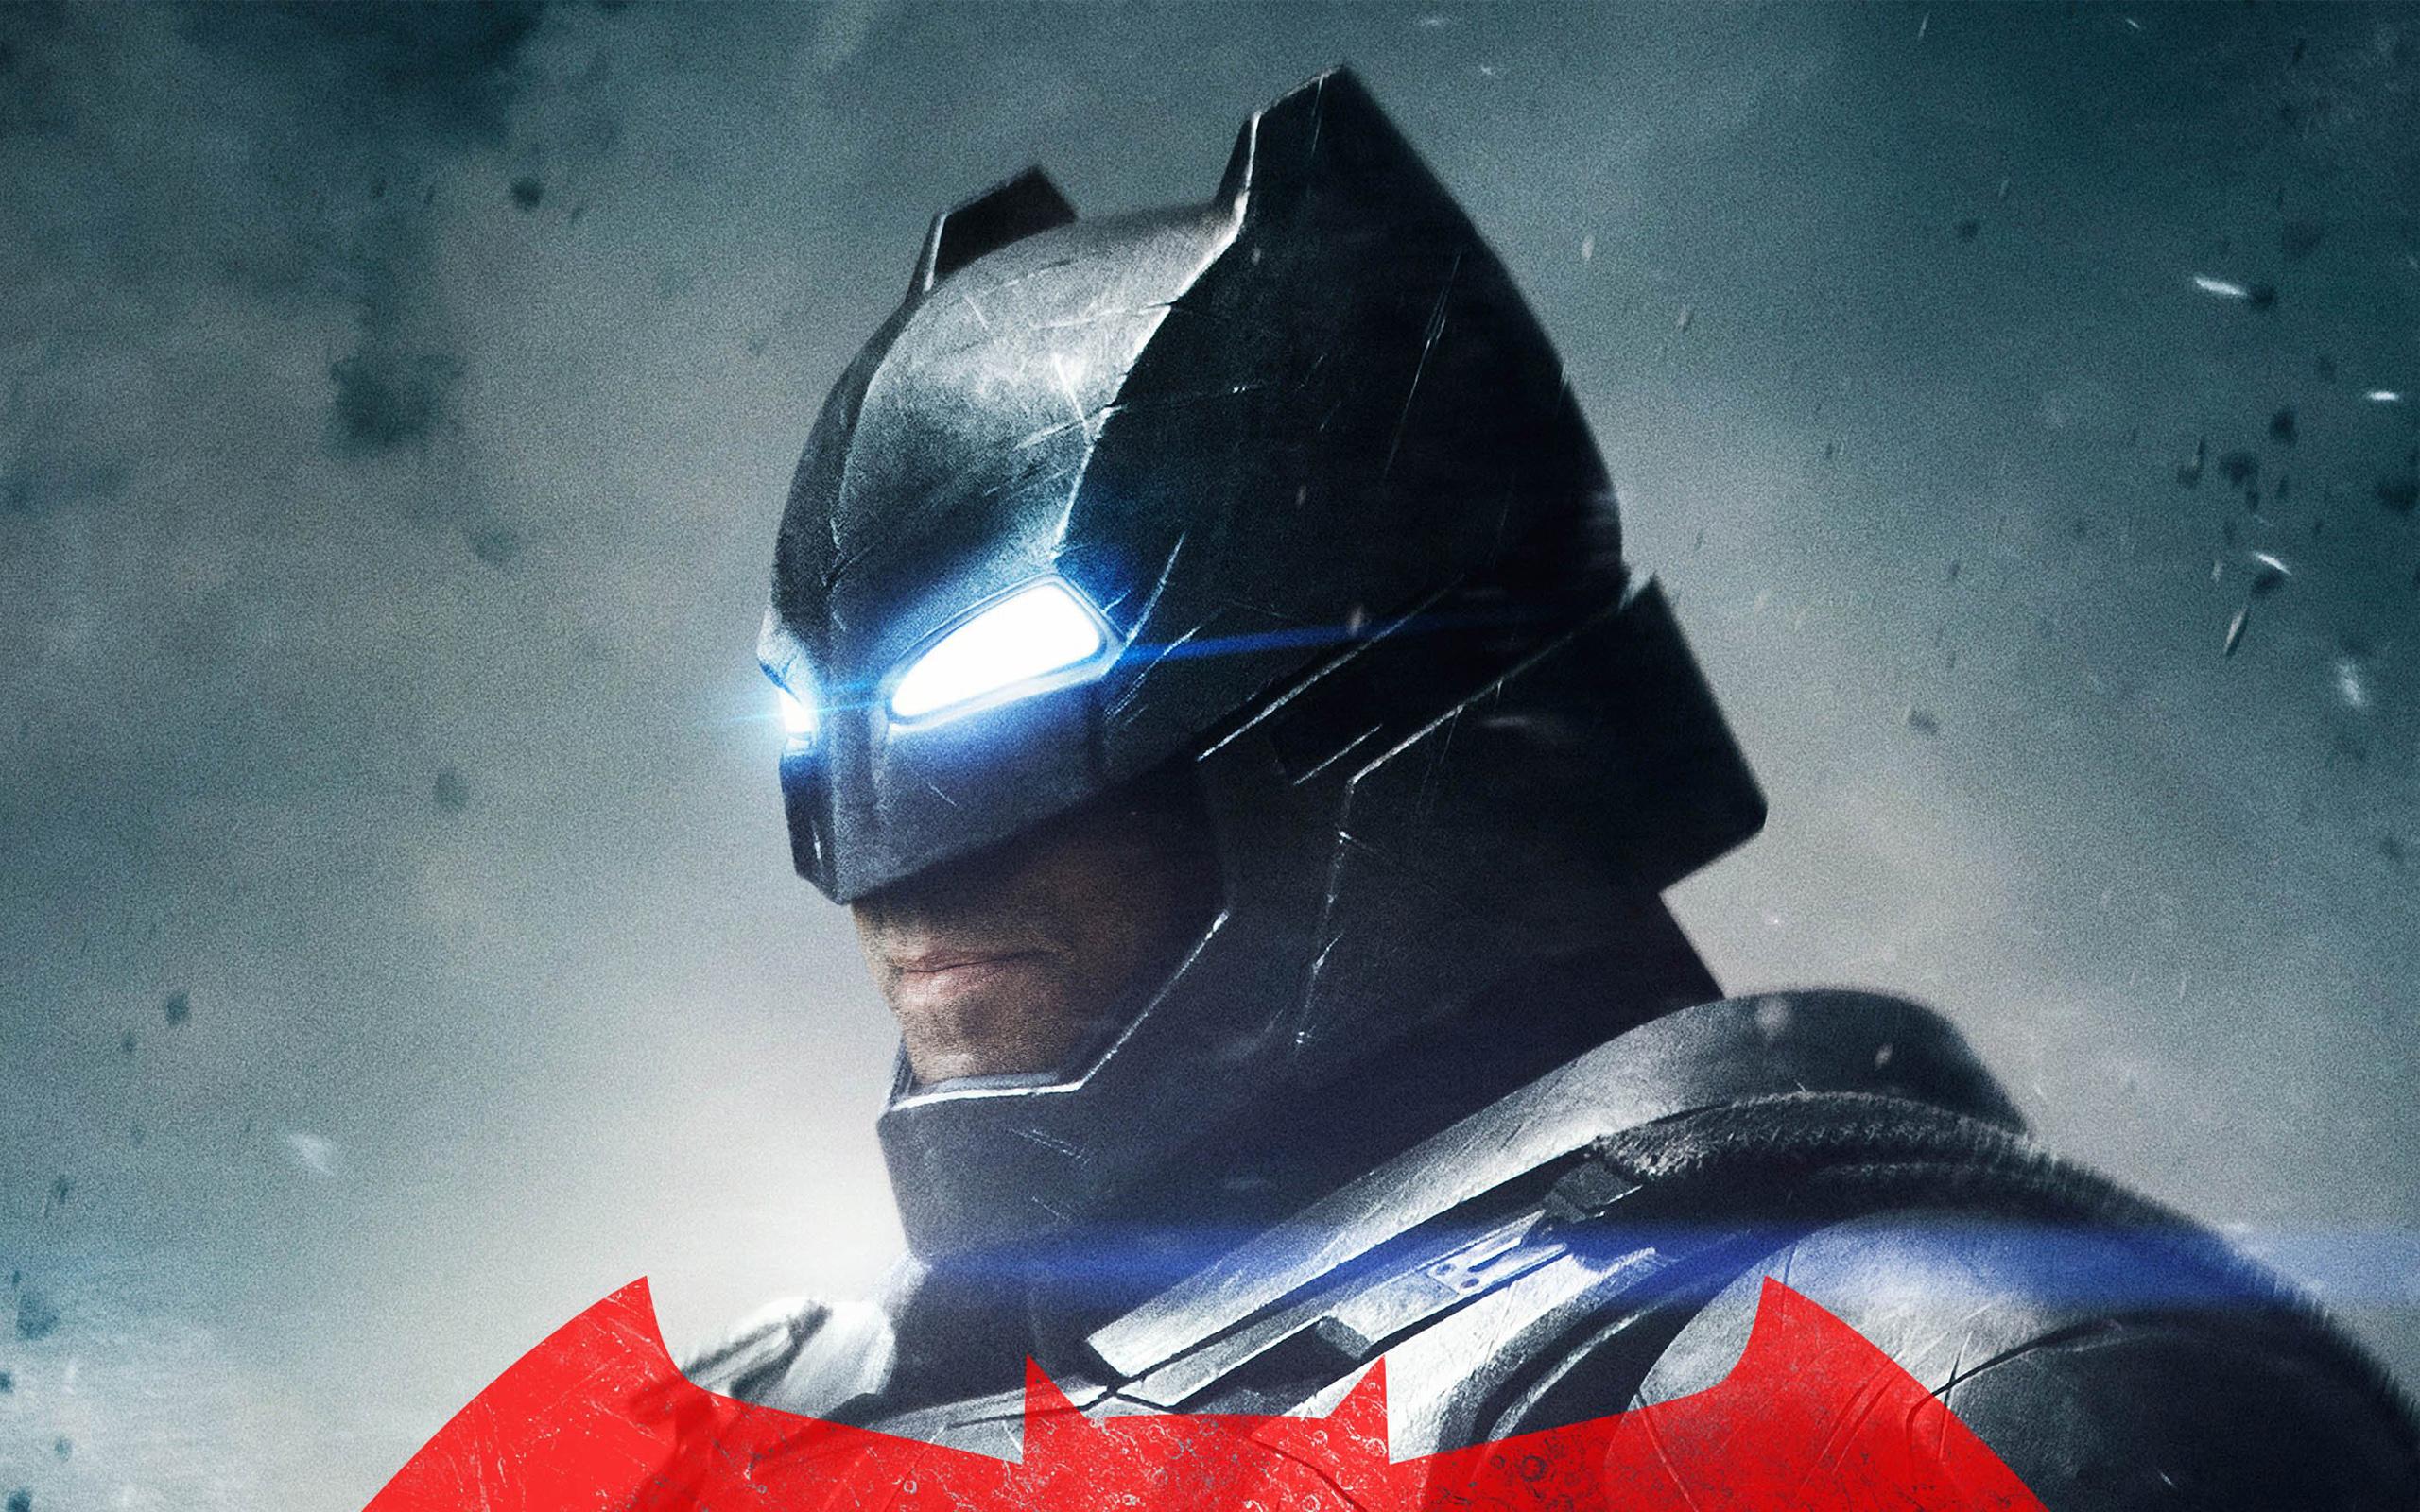 Batman Vs Superman Hd Movies 4k Wallpapers Images Backgrounds